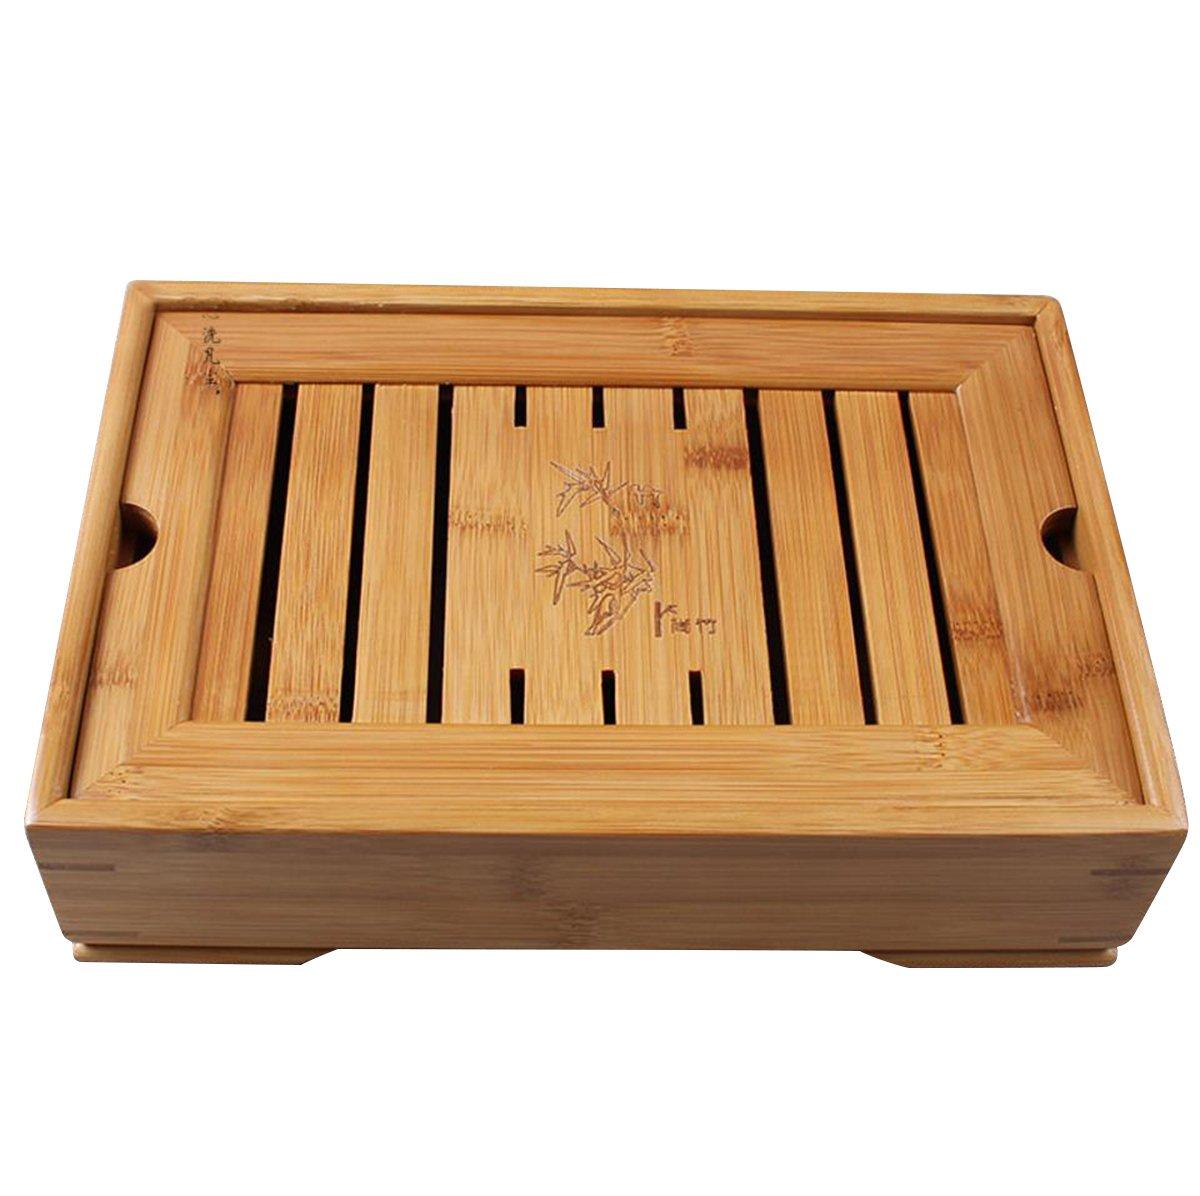 Hoobar Reservoir Type Bamboo Tea Tray - Chinese Kungfu Tea Table Serving Tray Box for Kungfu Tea Set